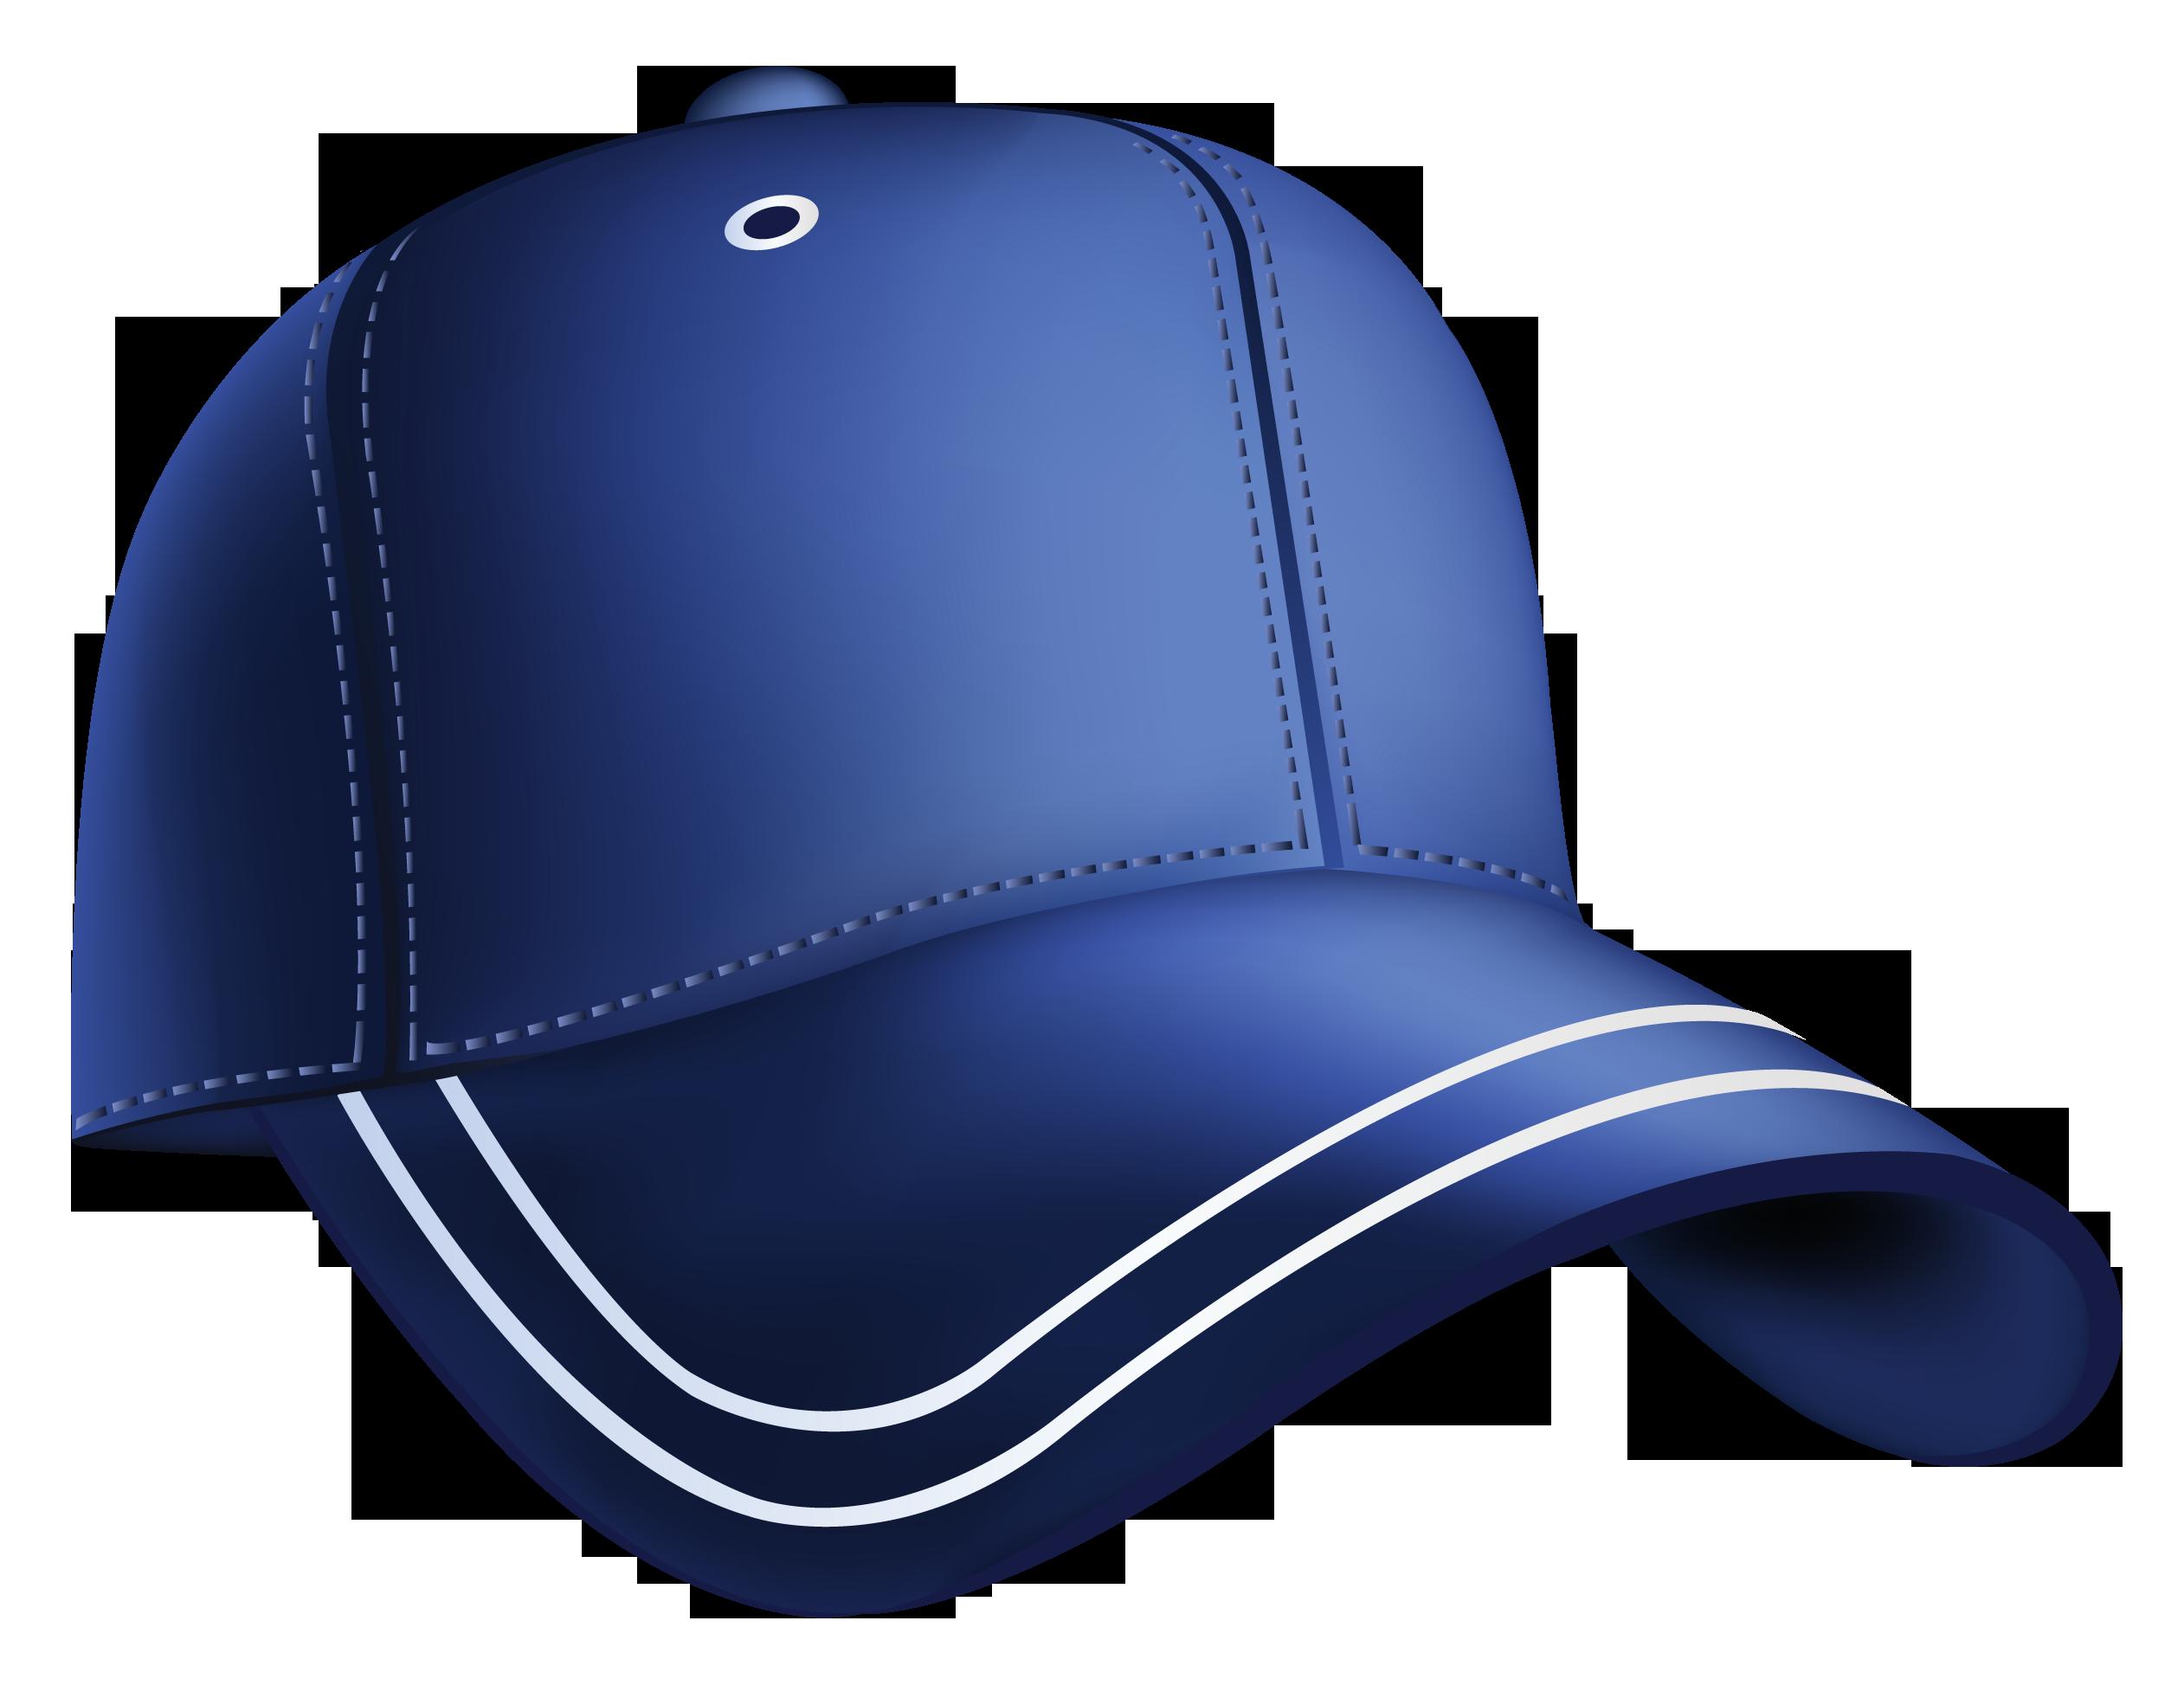 Baseball Hat Clip Art Cliparts Co-Baseball Hat Clip Art Cliparts Co-2